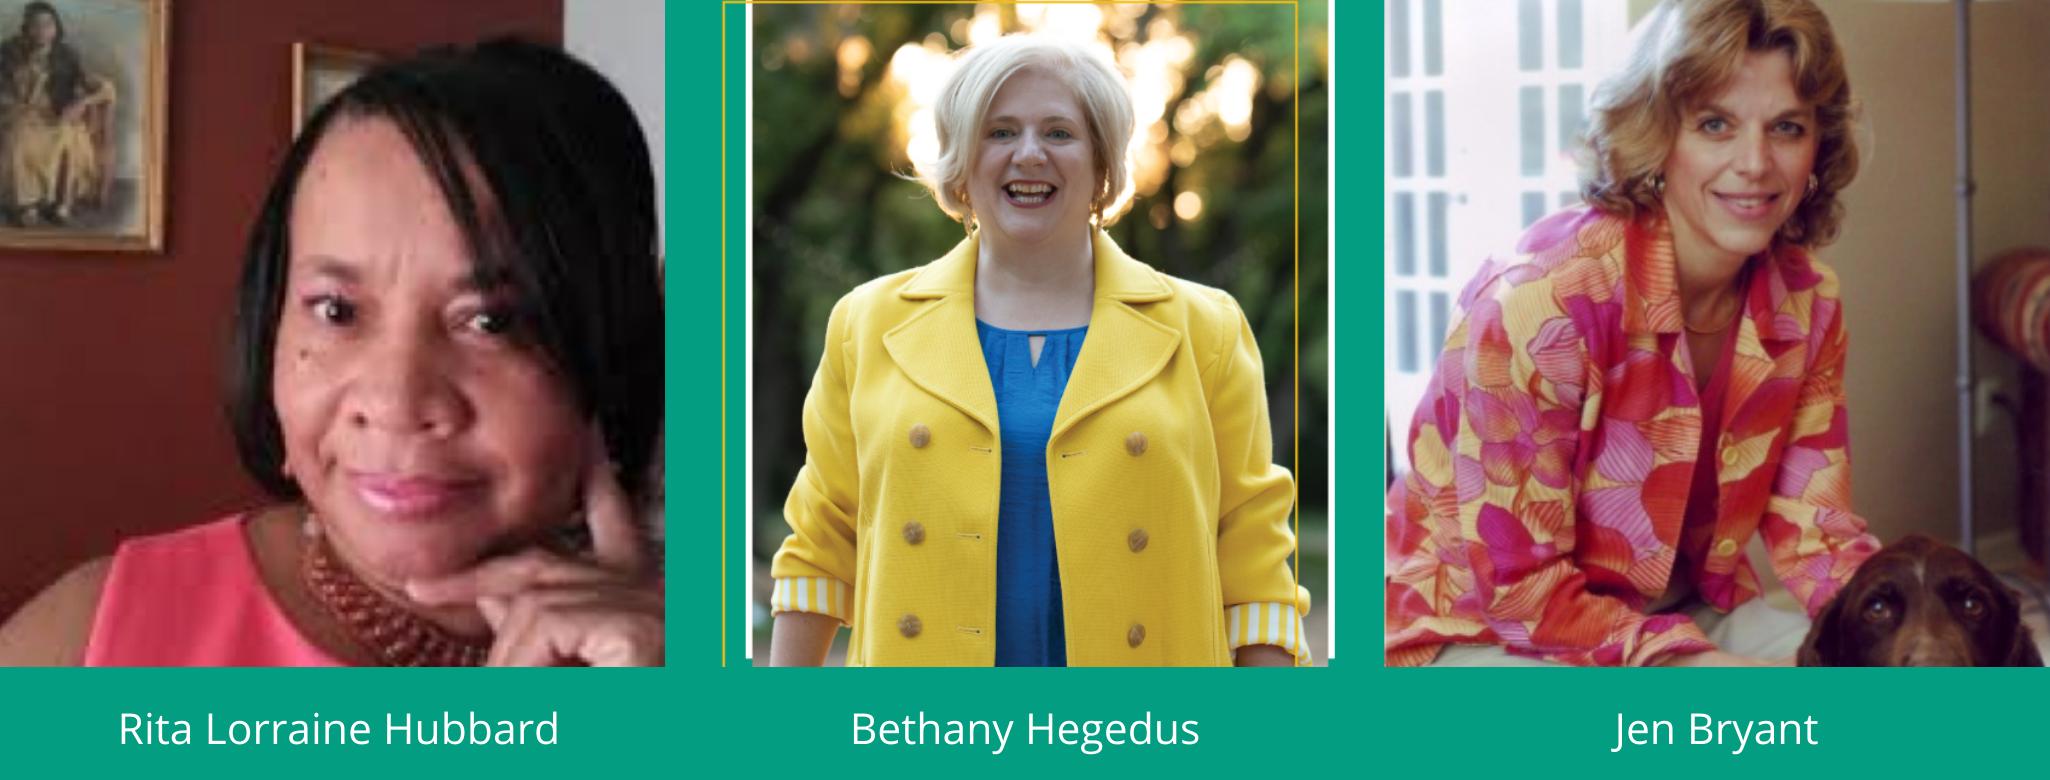 Rita Lorraine Hubbard, Bethany Hegedus, Jen Bryant